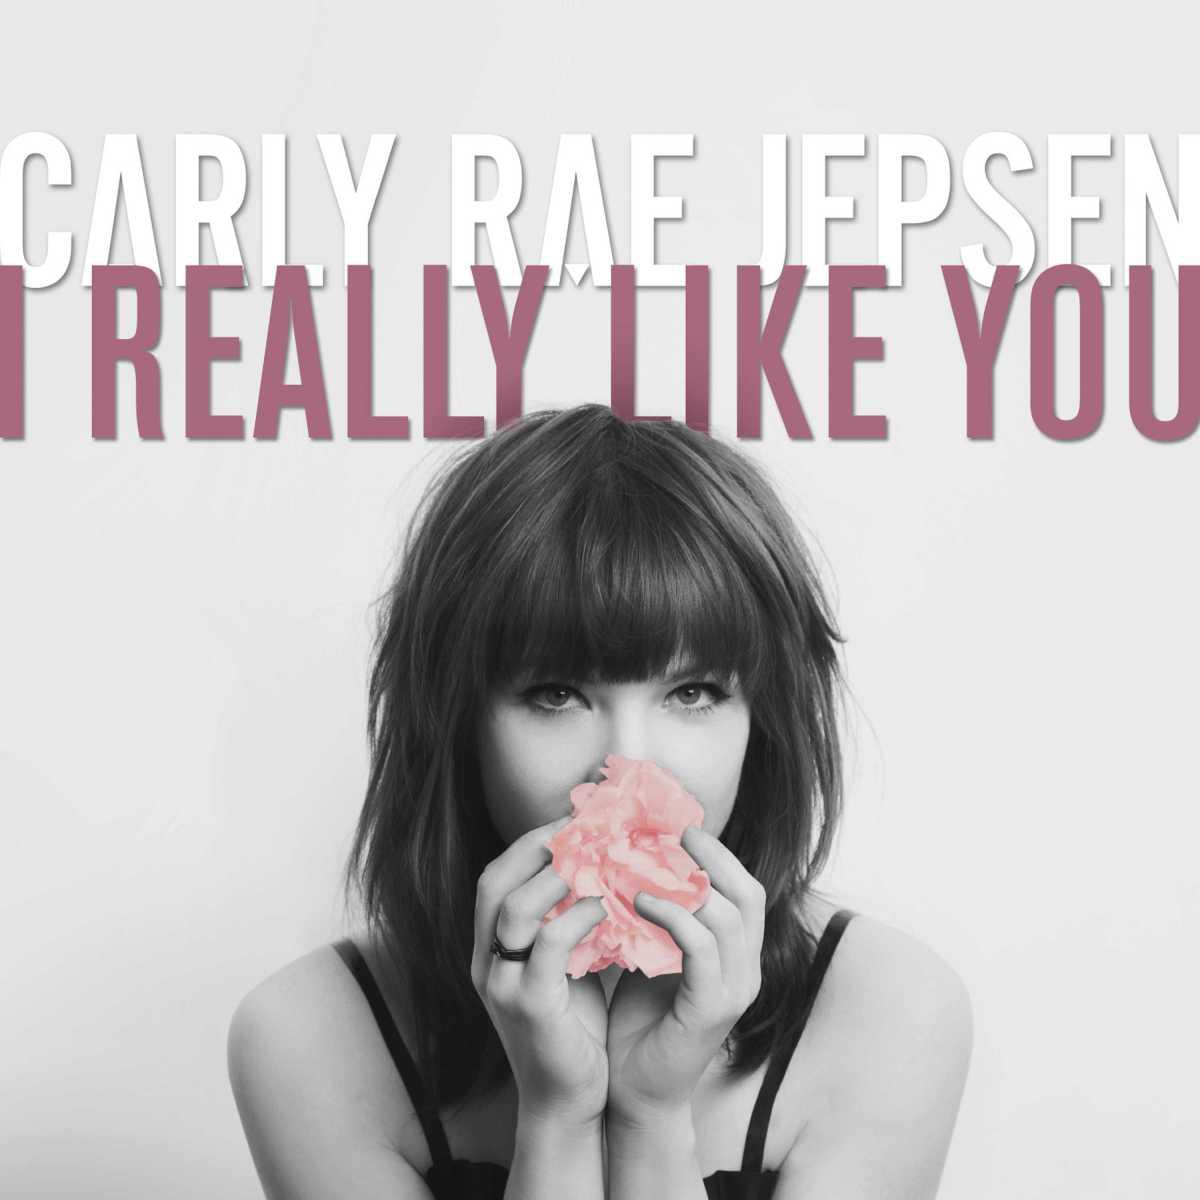 Hot Video Alert: Carly Rae Jepsen - I Really Like You